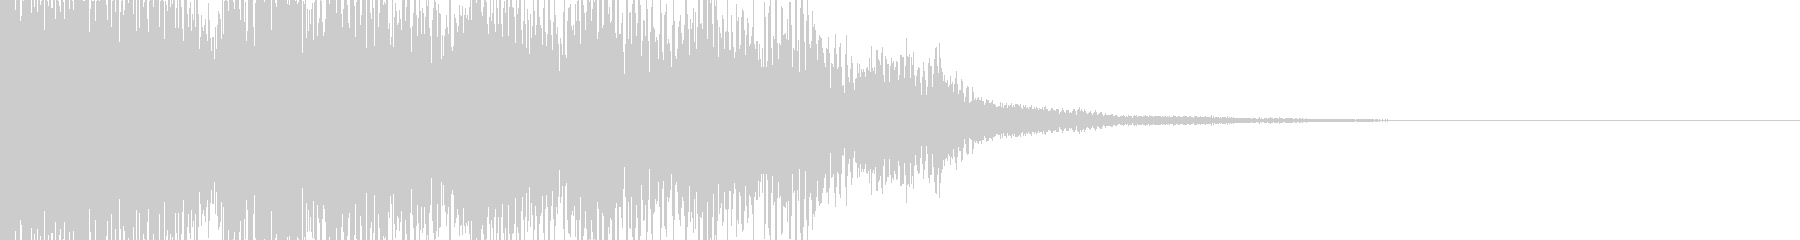 Kawaii 可愛い 効果音 4の未再生の波形